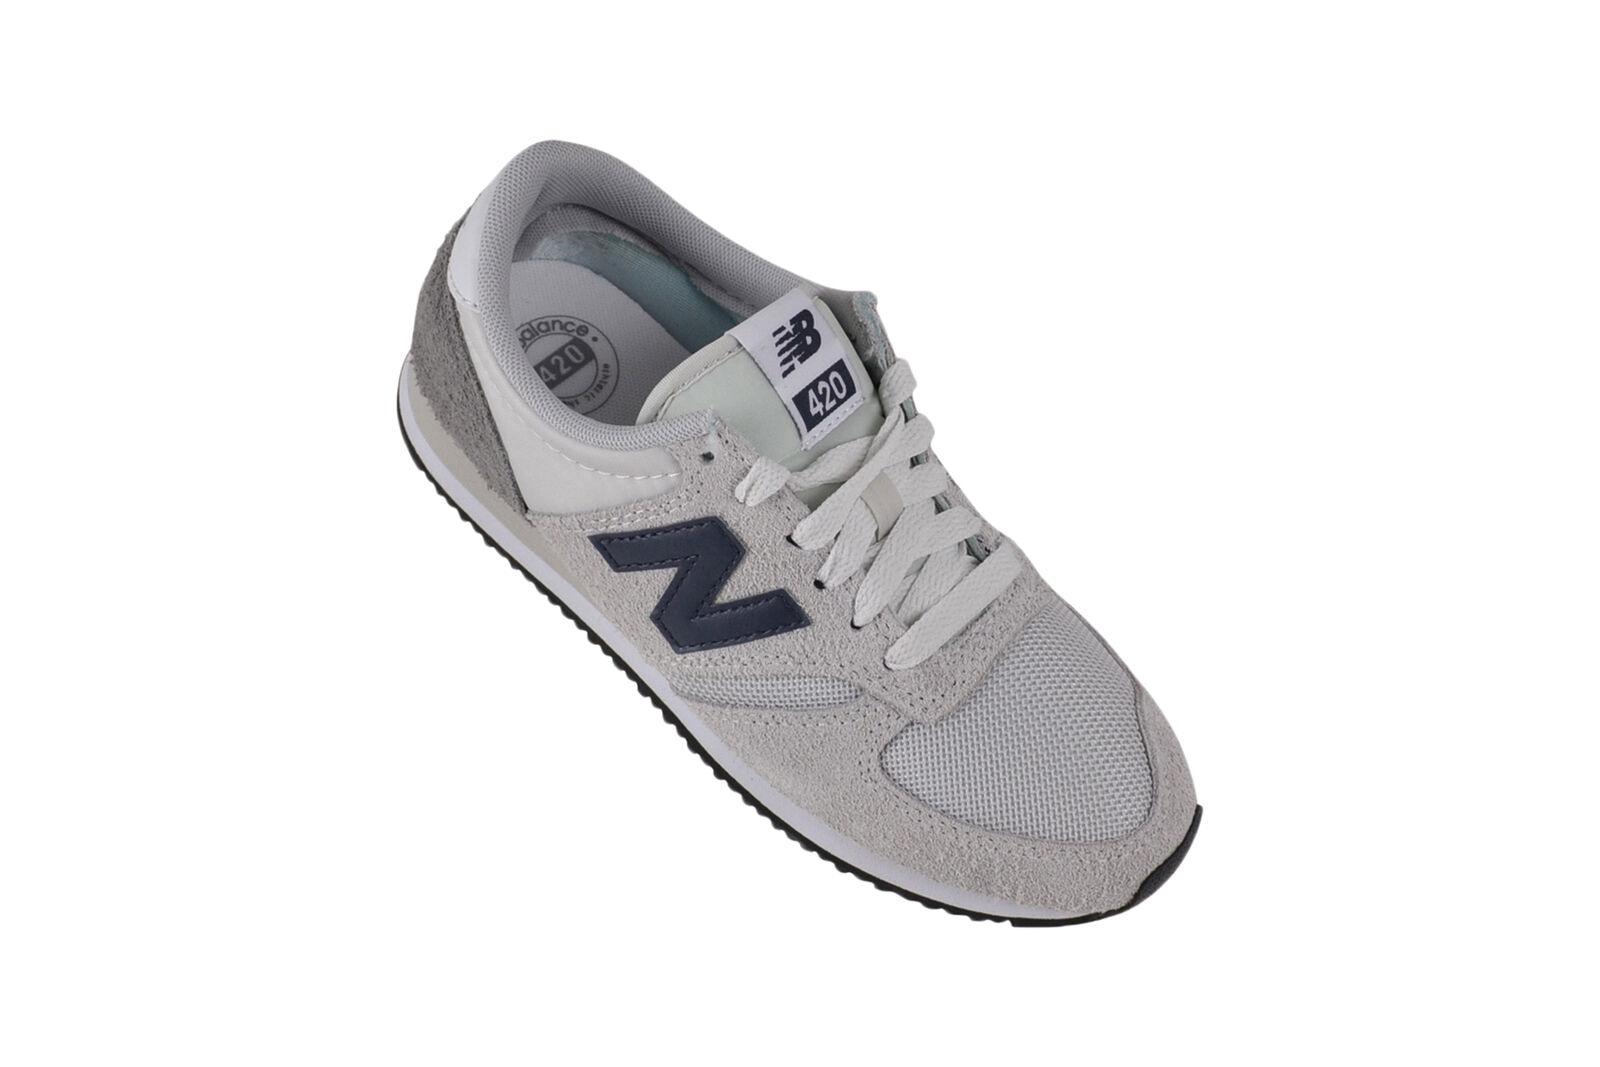 New balance u420 ggw blanco zapatilla de deporte zapatos gris blancoo